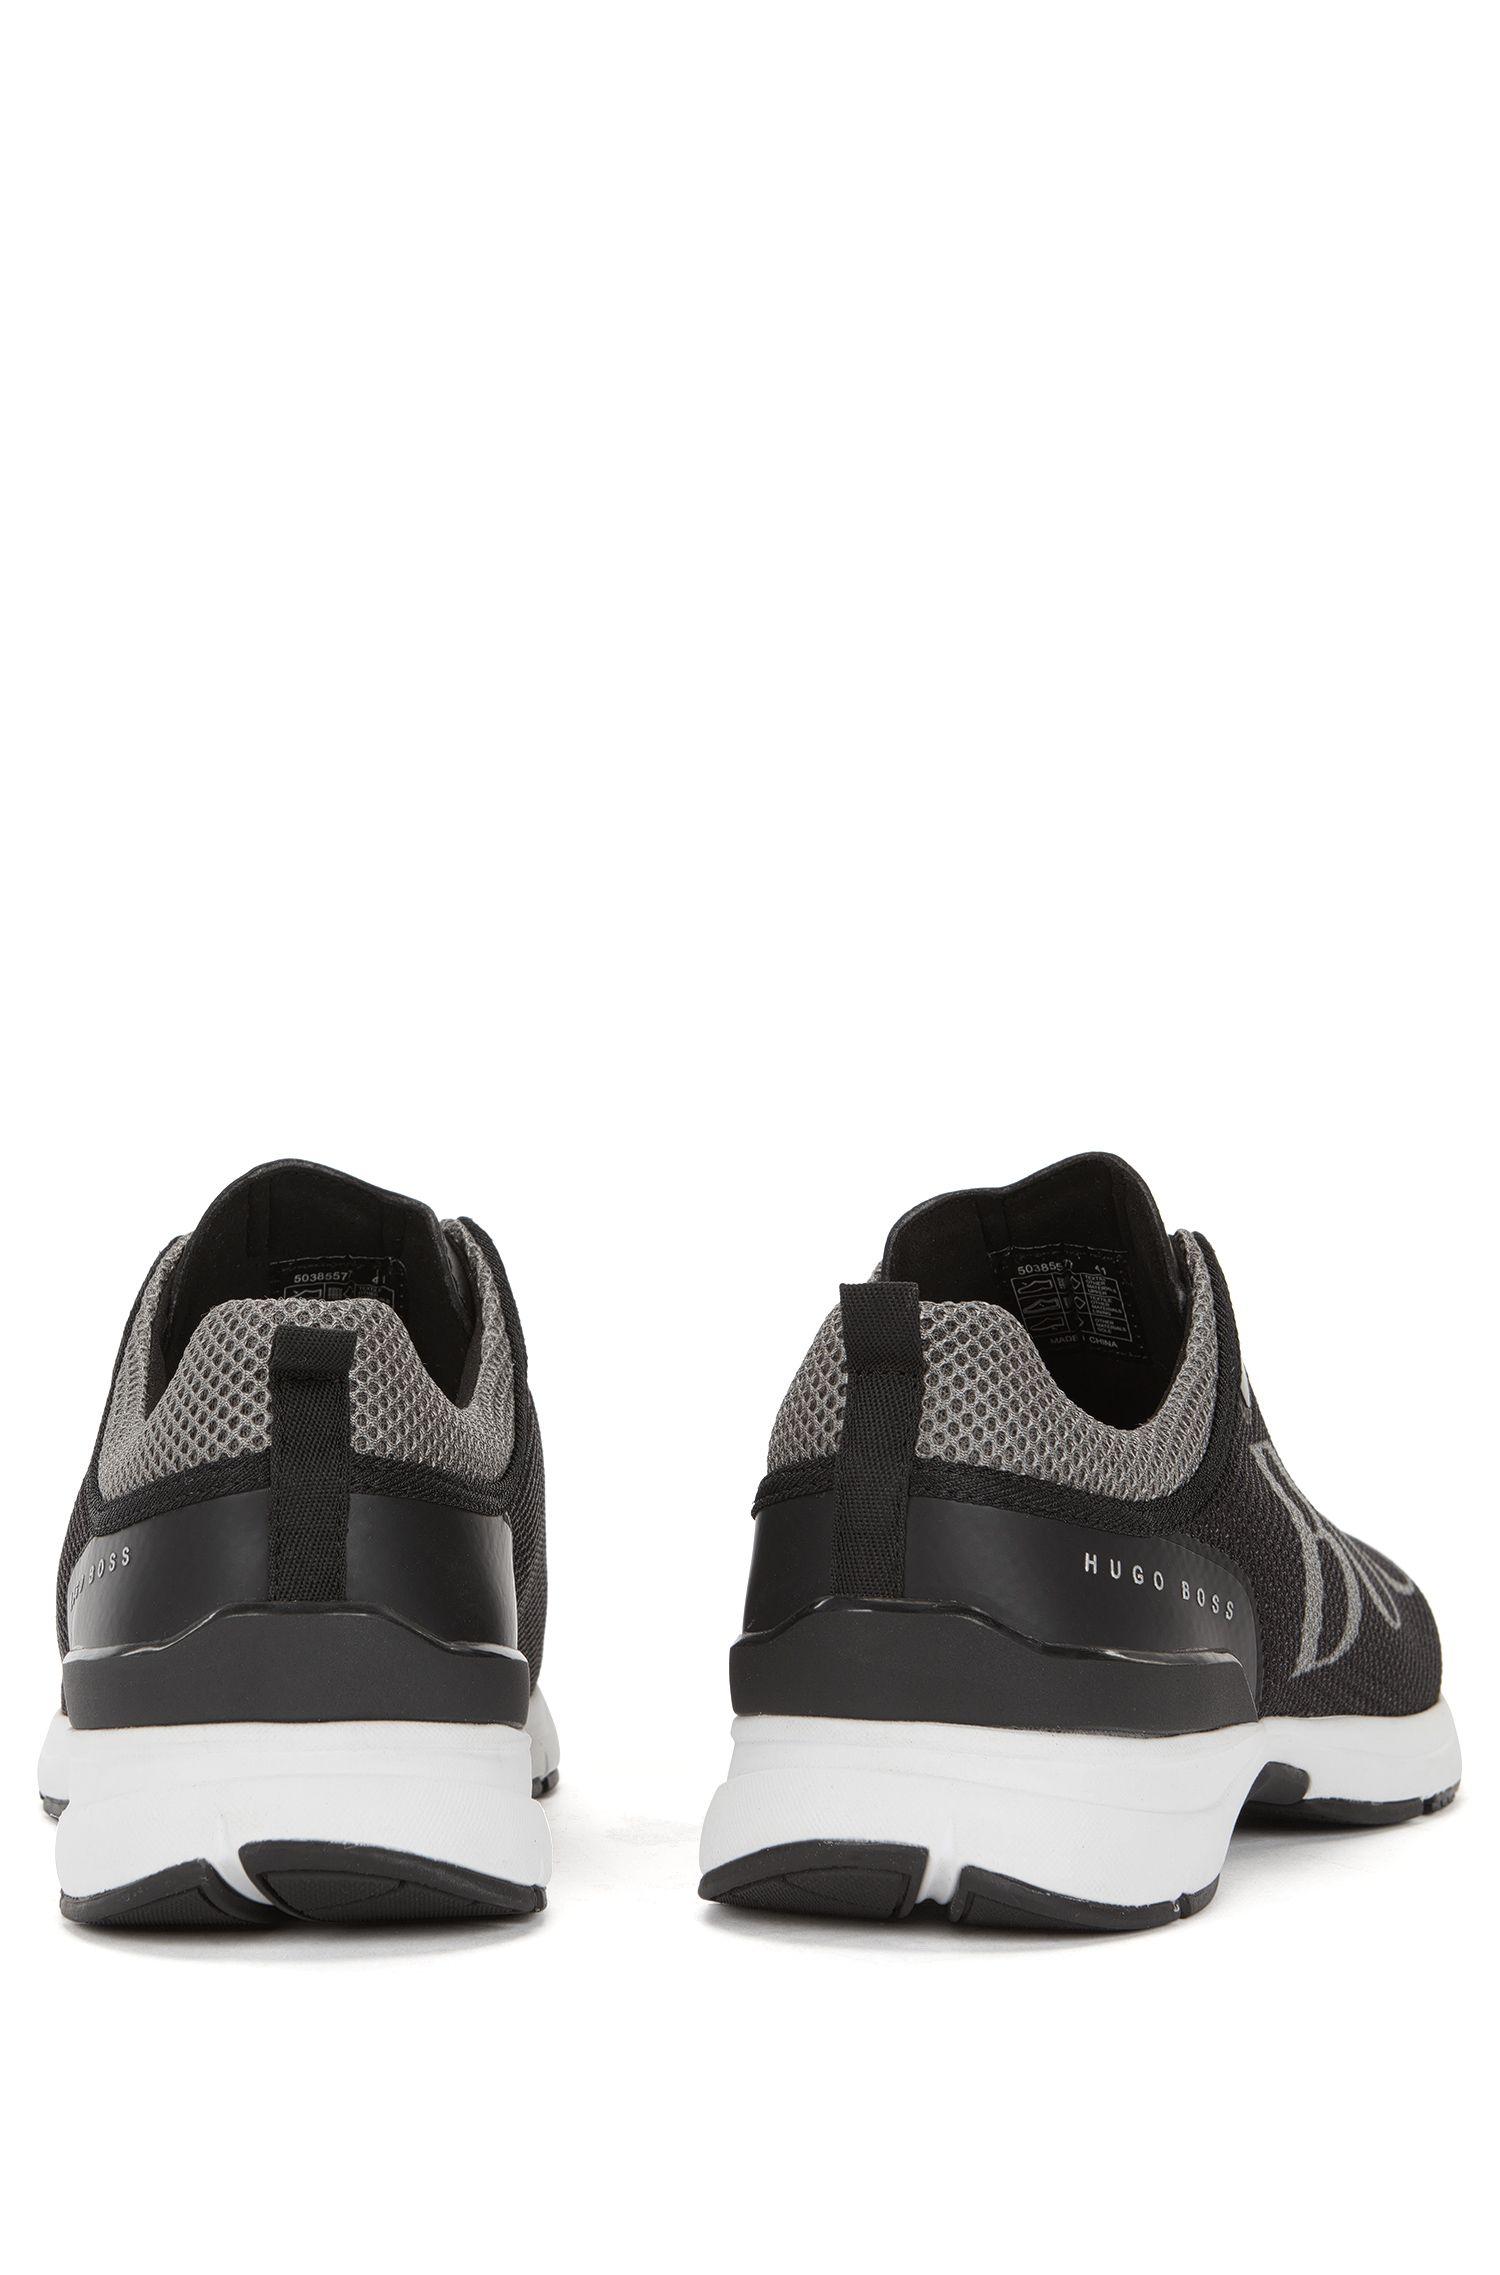 Mesh-Sneakers aus Material-Mix mit Strobel-Machart